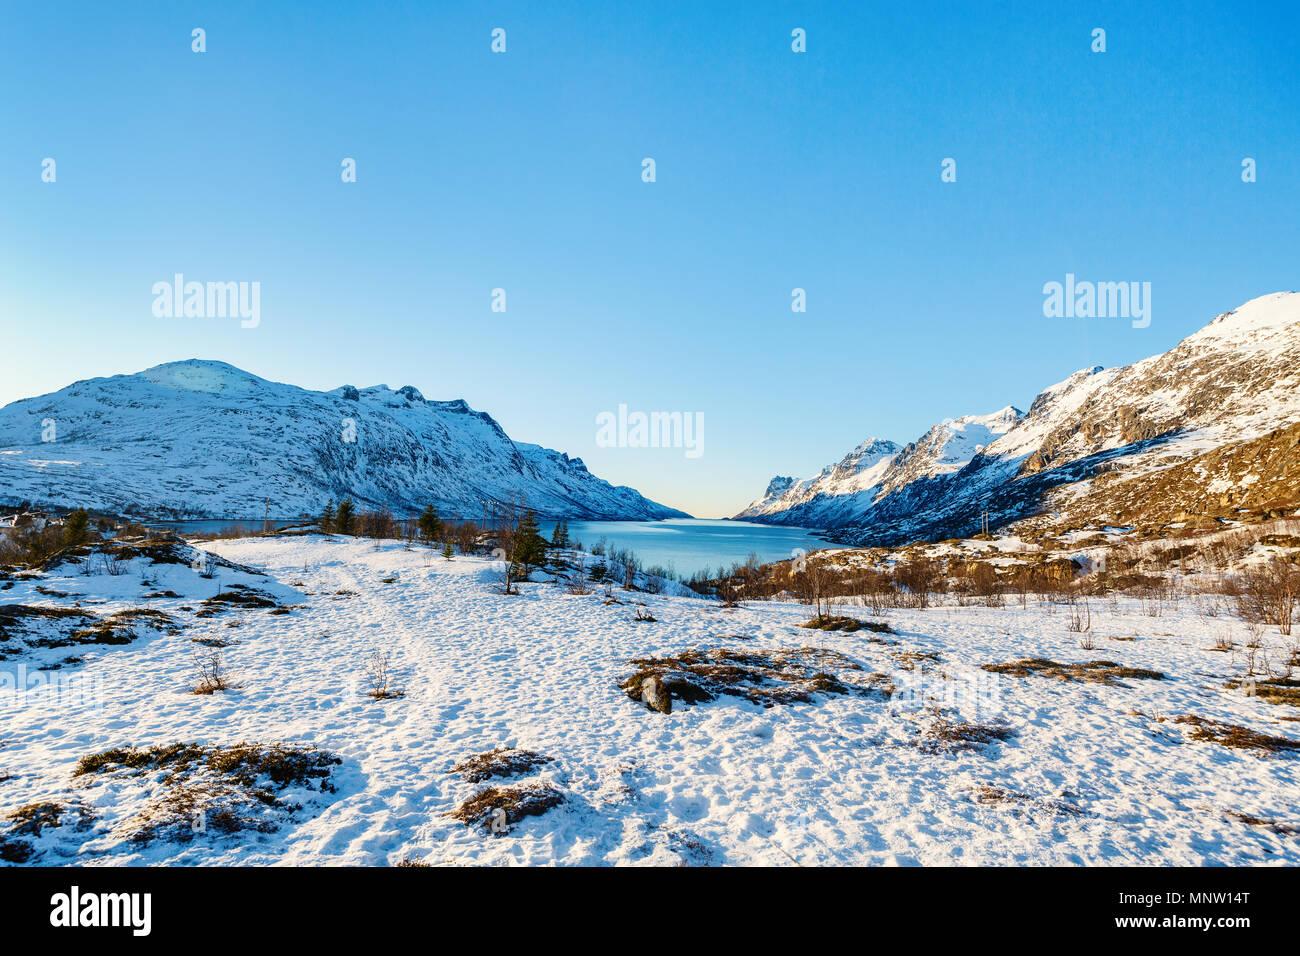 Winter landscape of breathtaking fjords scenery of Senja island in Northern Norway Stock Photo